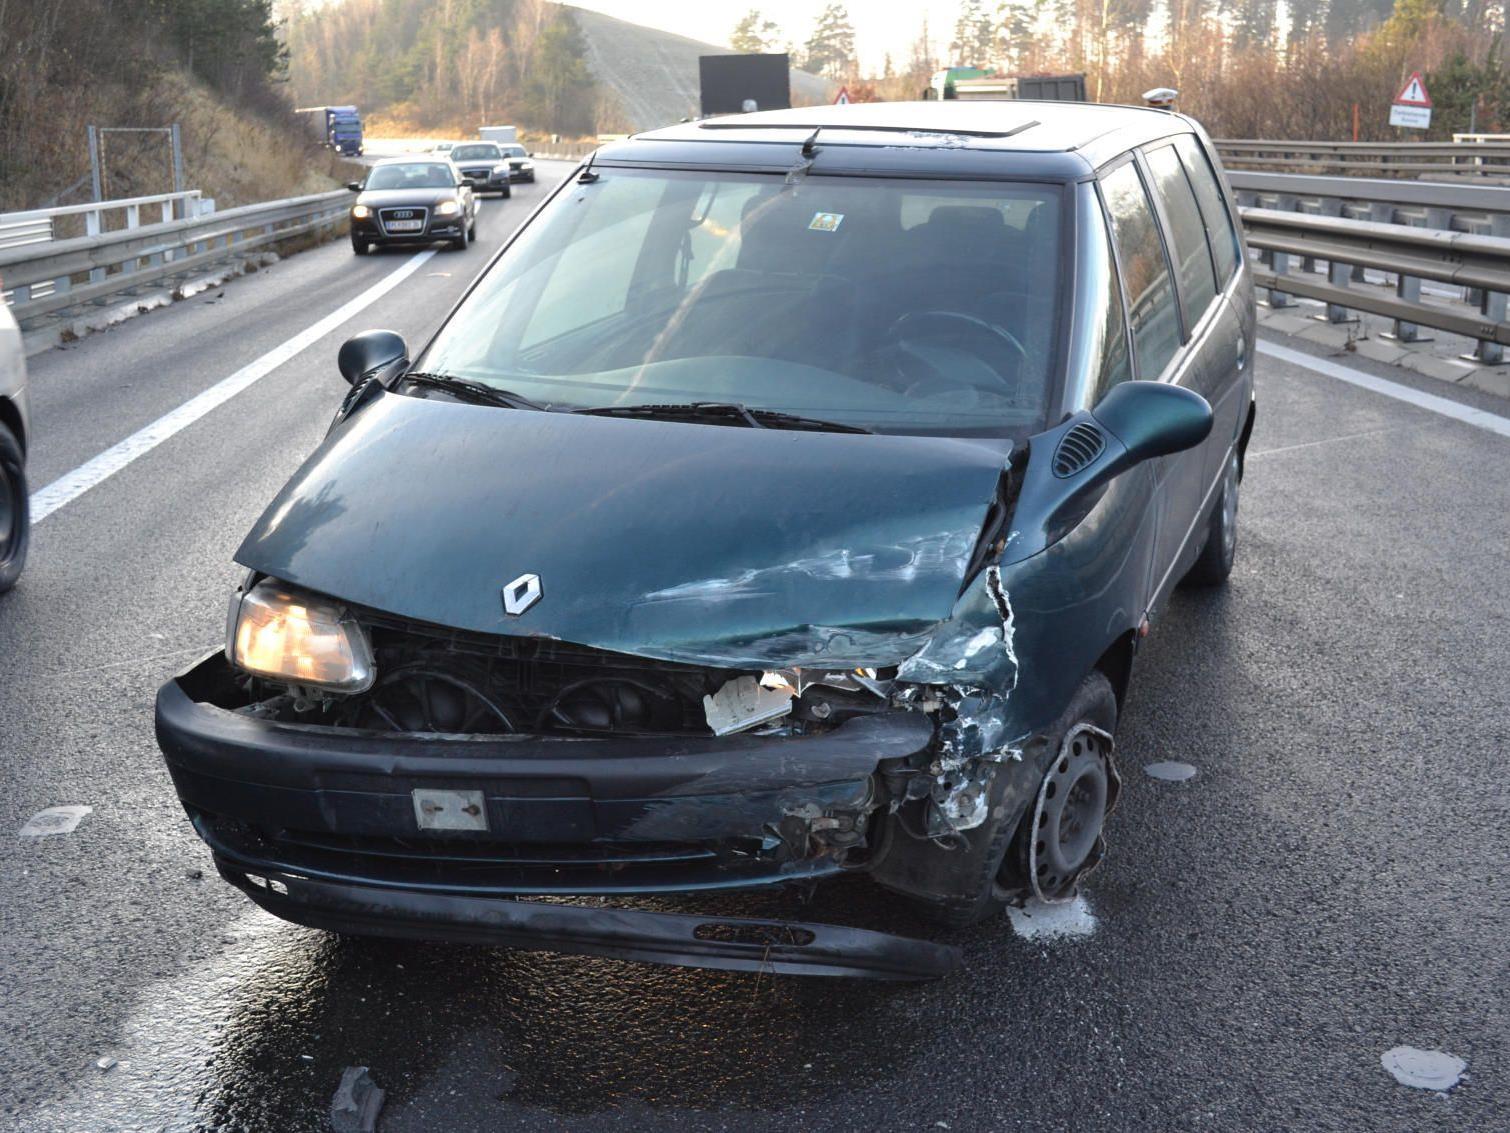 Glück im Unglück: Auto kaputt, Fahrer nur erschreckt.